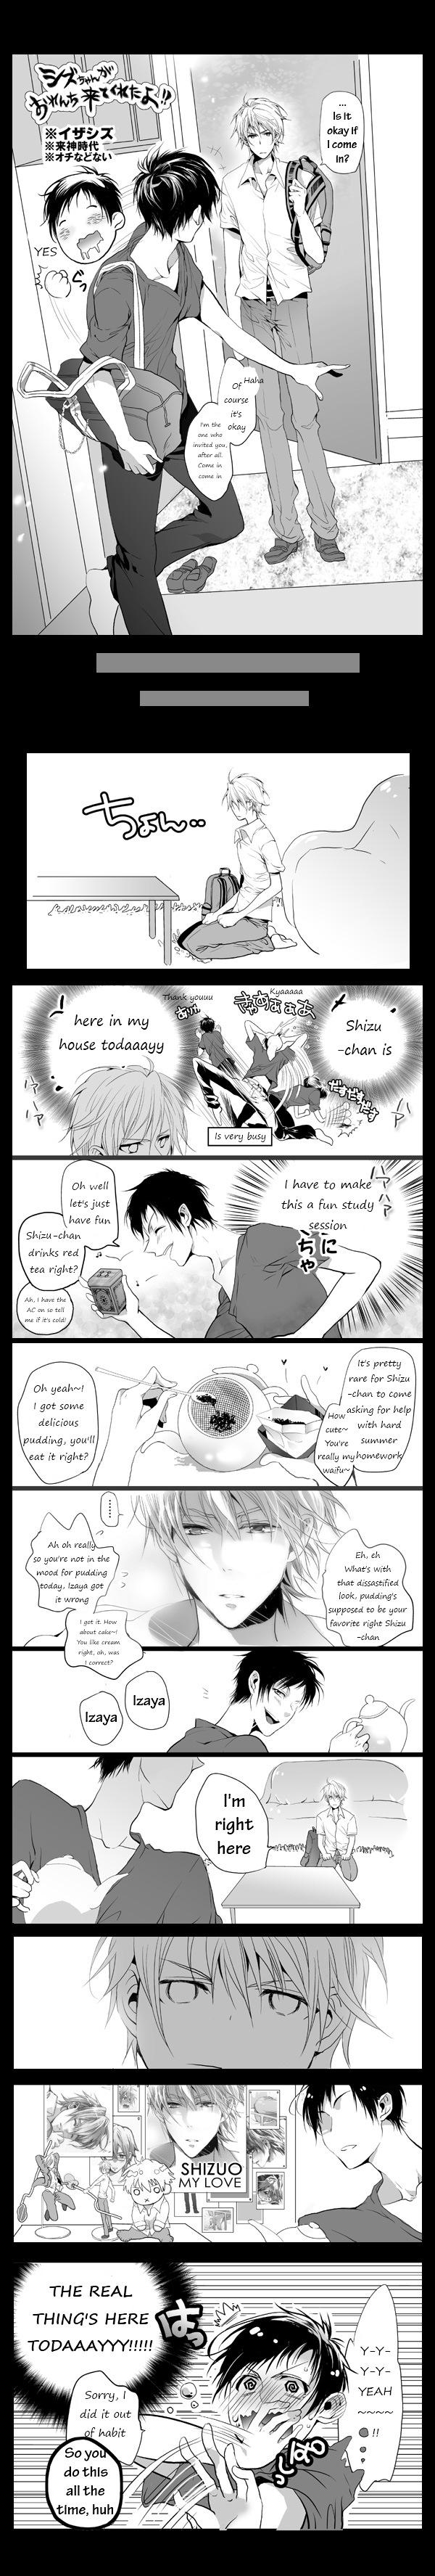 Tags: Anime, Owal, DURARARA!!, Heiwajima Shizuo, Orihara Izaya, Fanart, Pixiv, Translated, Comic